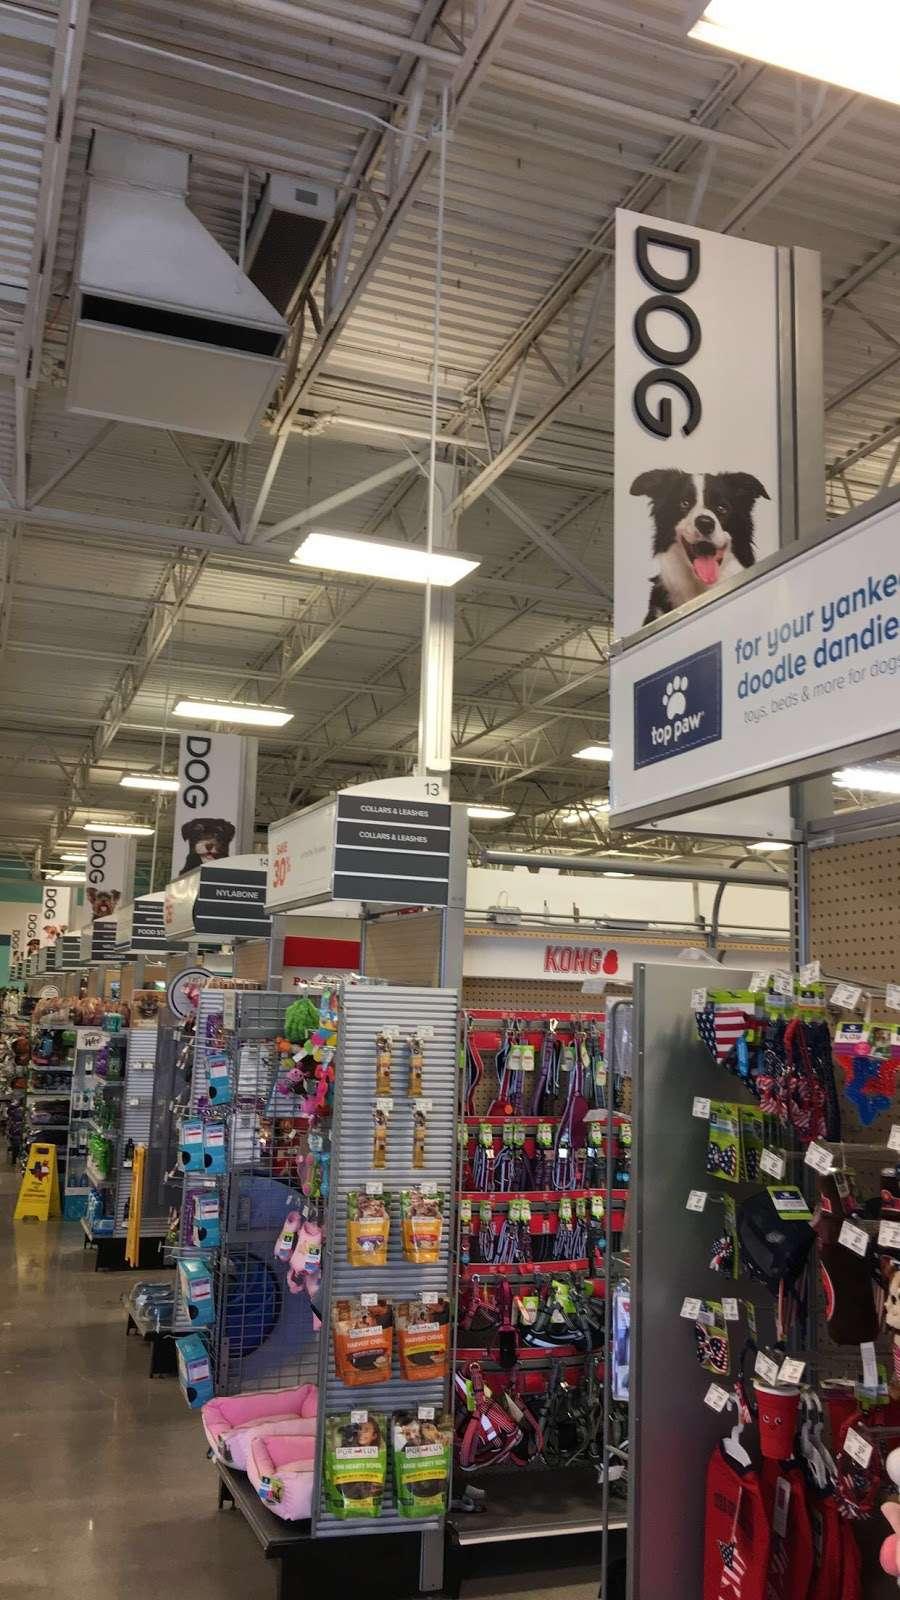 PetSmart - veterinary care  | Photo 6 of 10 | Address: 20518 Hwy 59 N, Humble, TX 77338, USA | Phone: (281) 540-1274